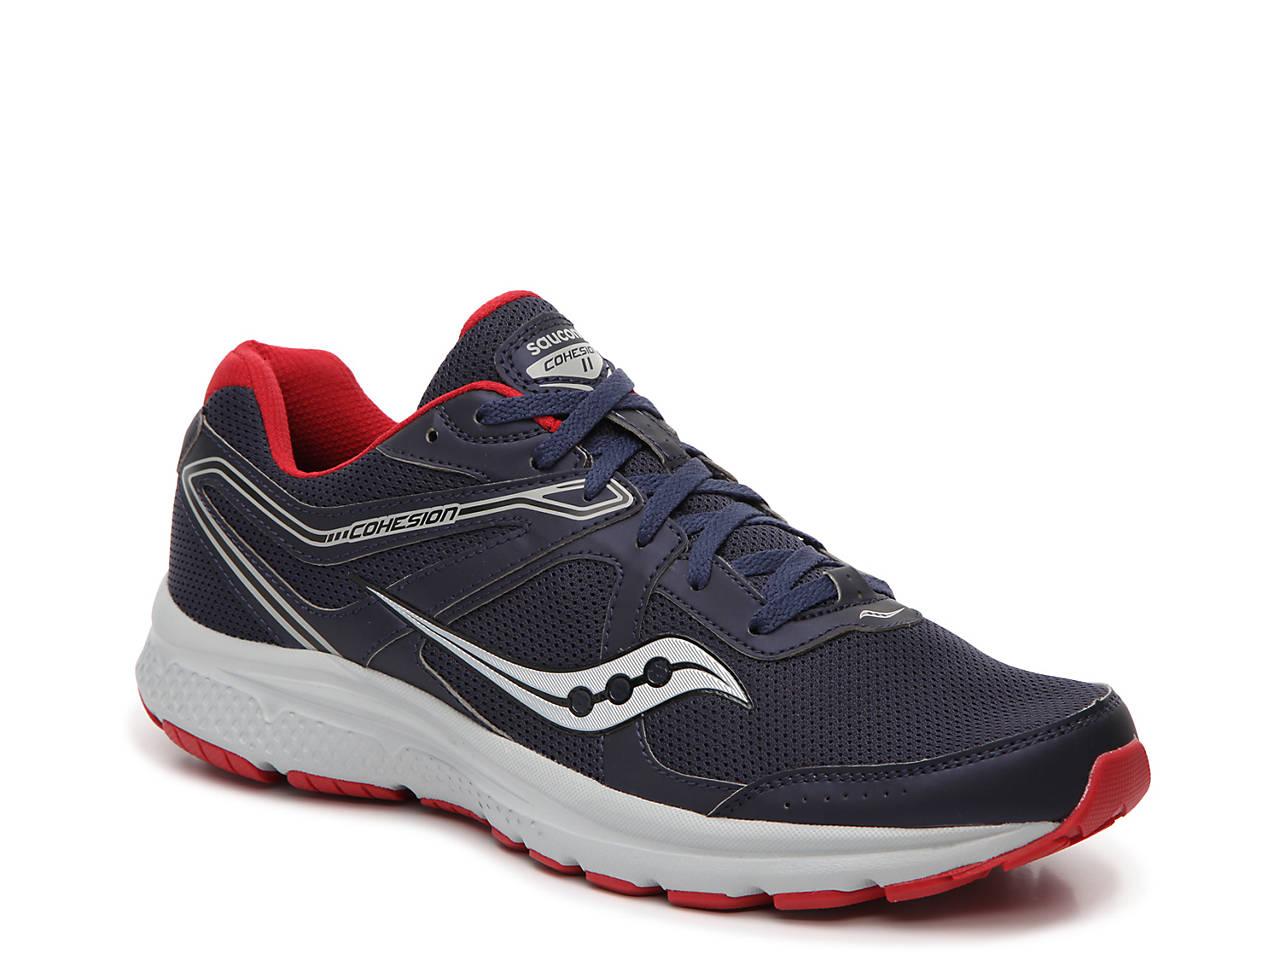 0024254d2ada Saucony Cohesion 11 Running Shoe - Men s Men s Shoes